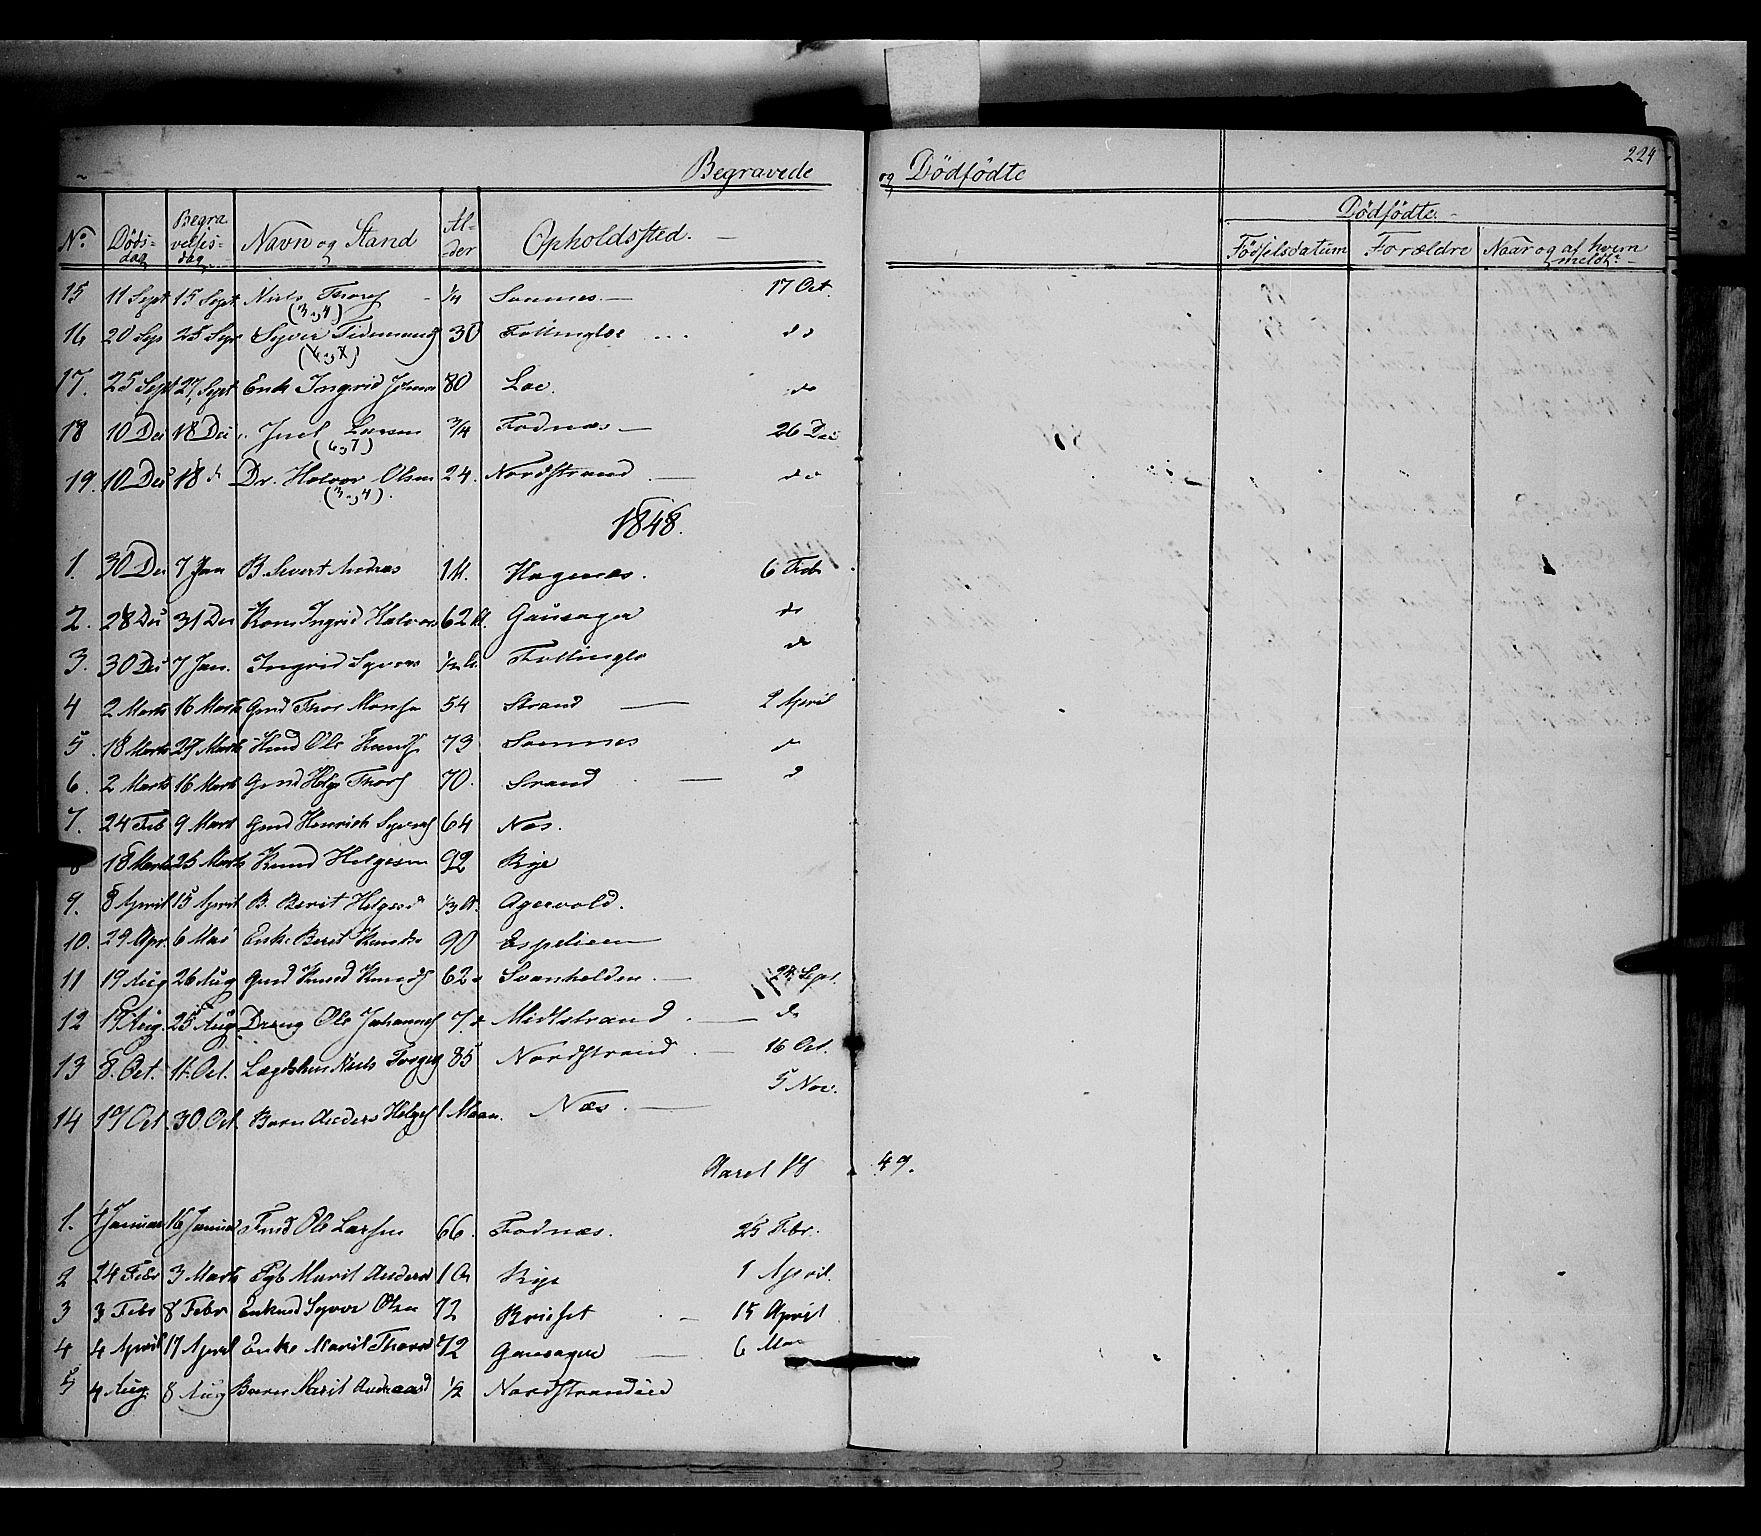 SAH, Nord-Aurdal prestekontor, Ministerialbok nr. 5, 1842-1863, s. 224